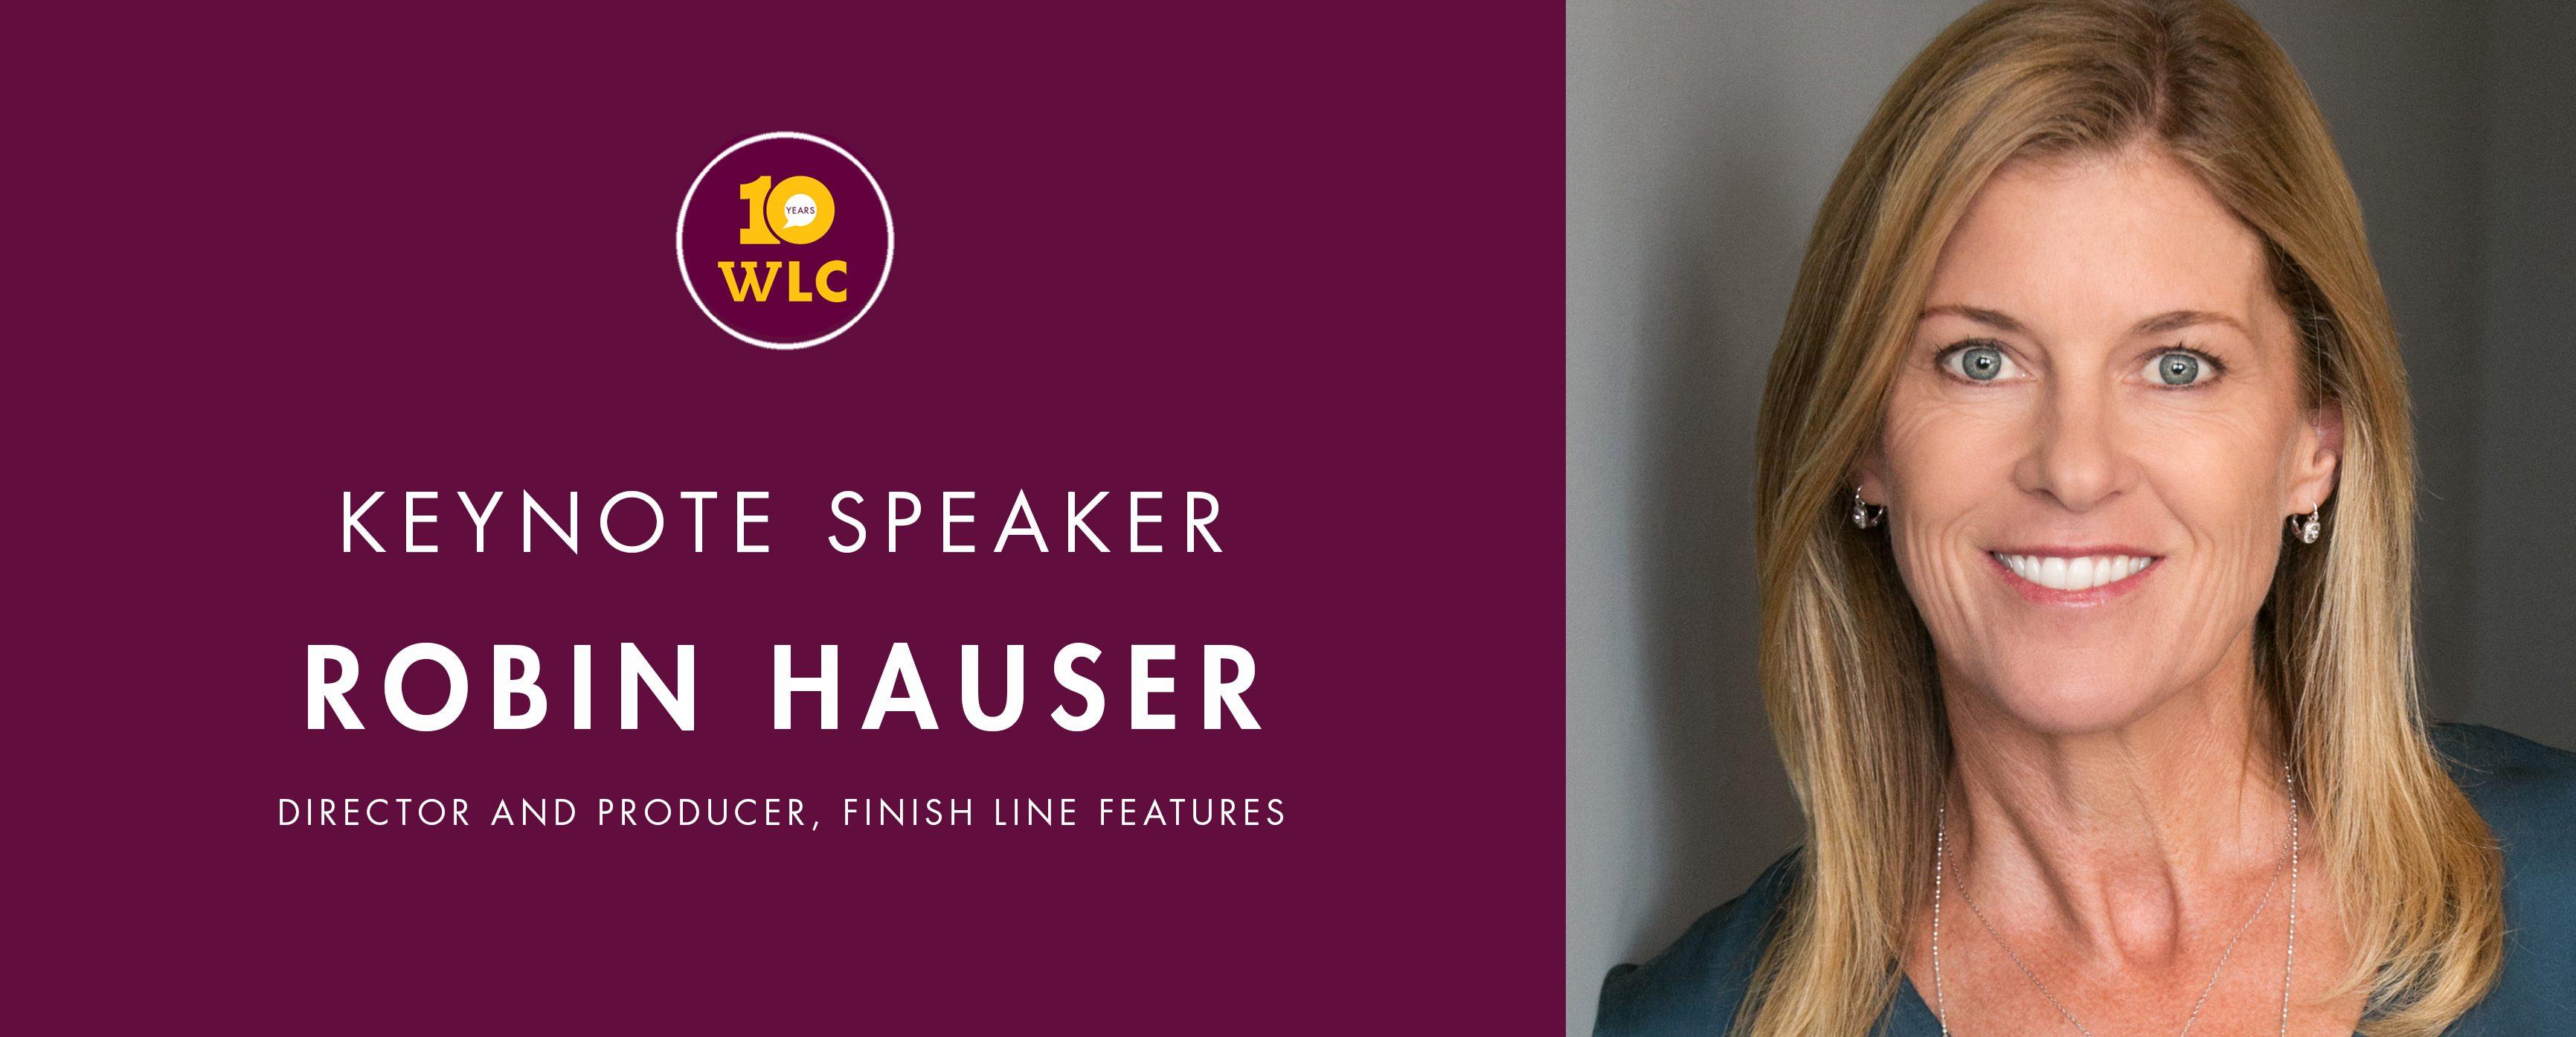 Keynote Speaker Robin Hauser